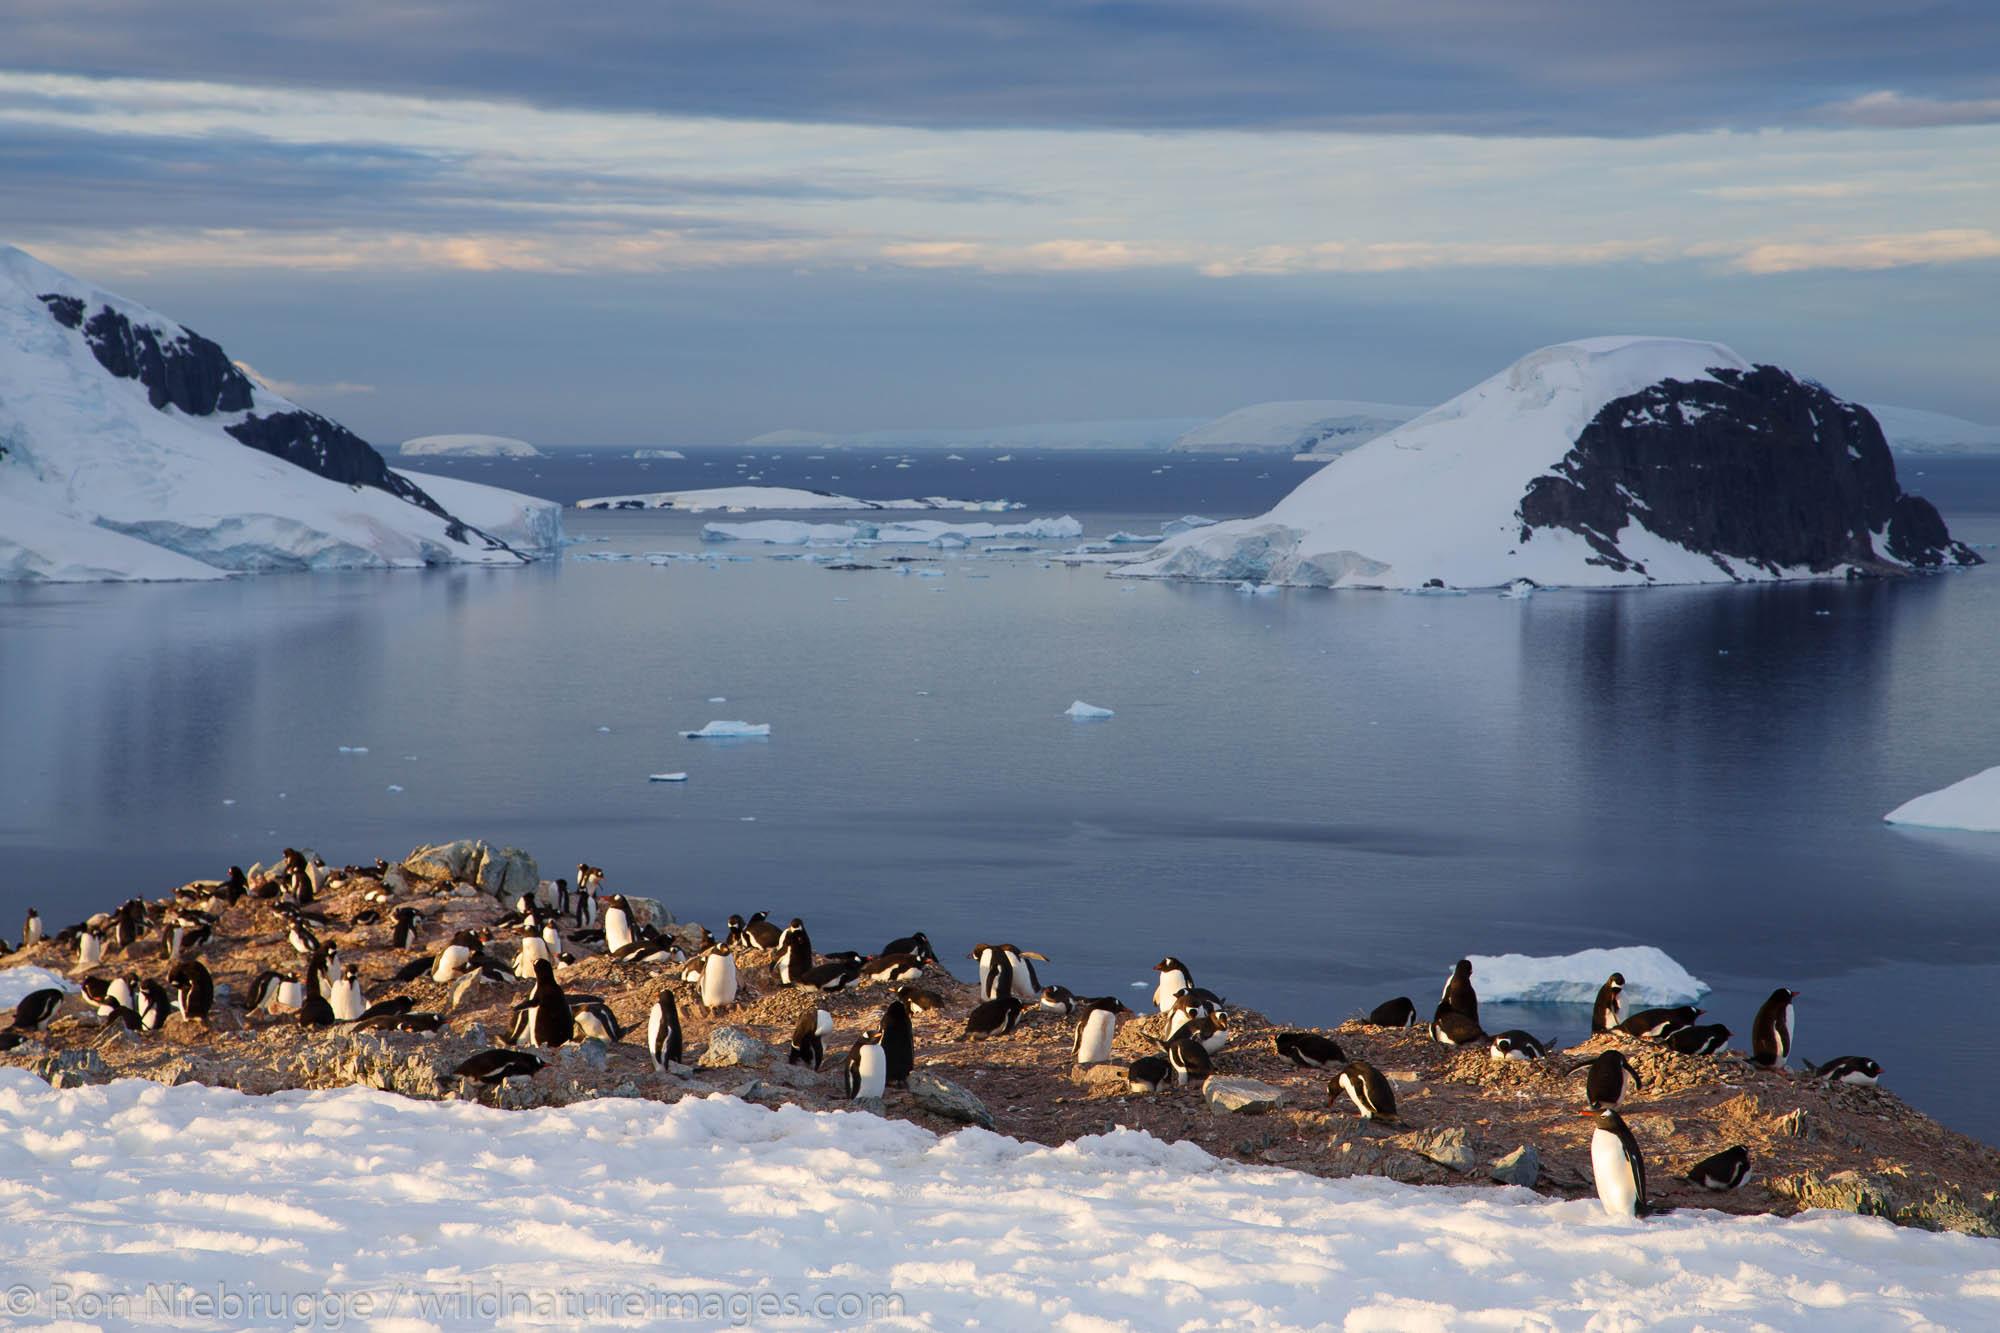 Gentoo Penguin (Pygoscelis papua) colony on Danco Island, Antarctica.